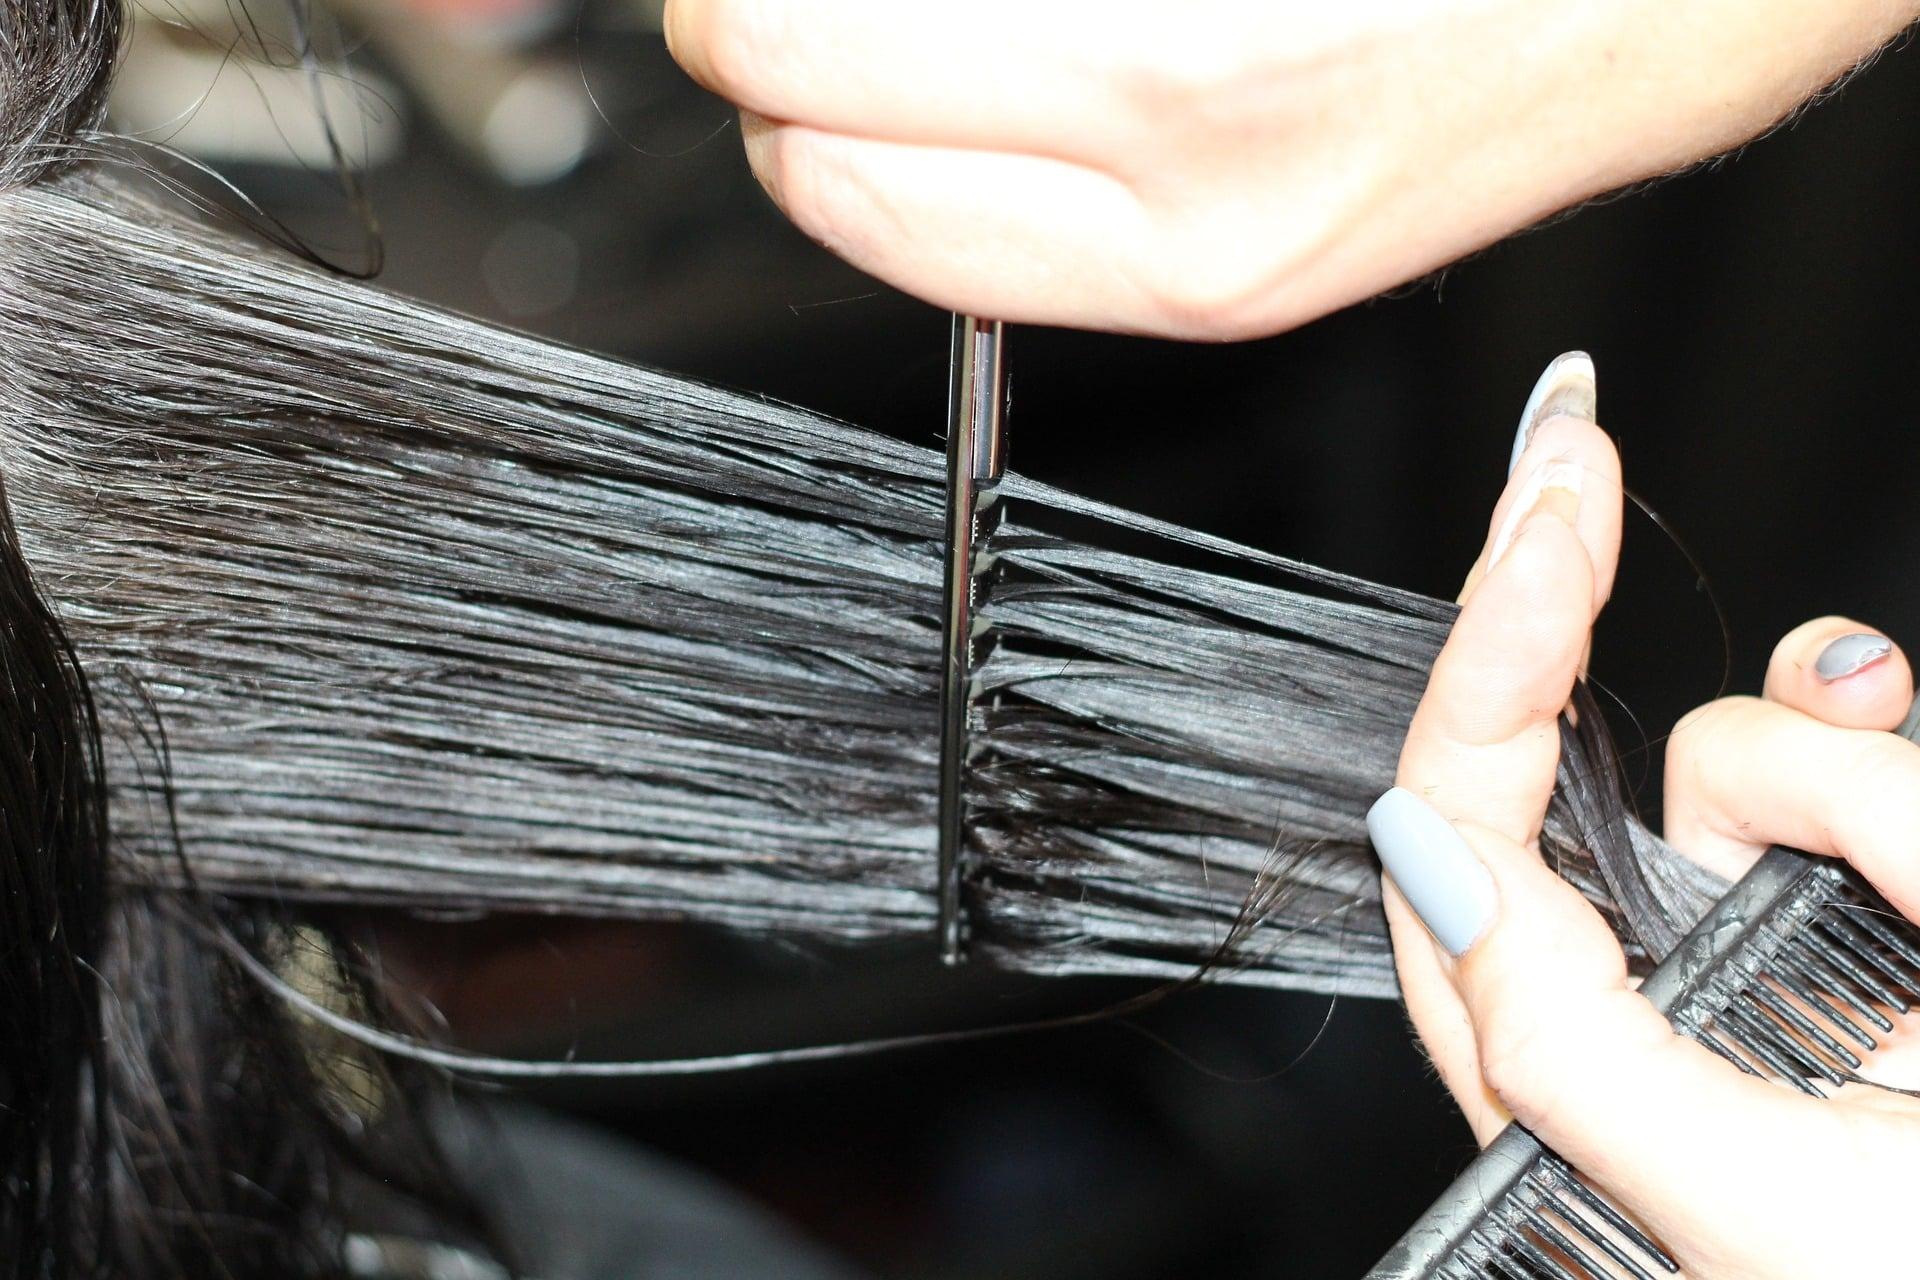 hairdressing image personal injury blog post